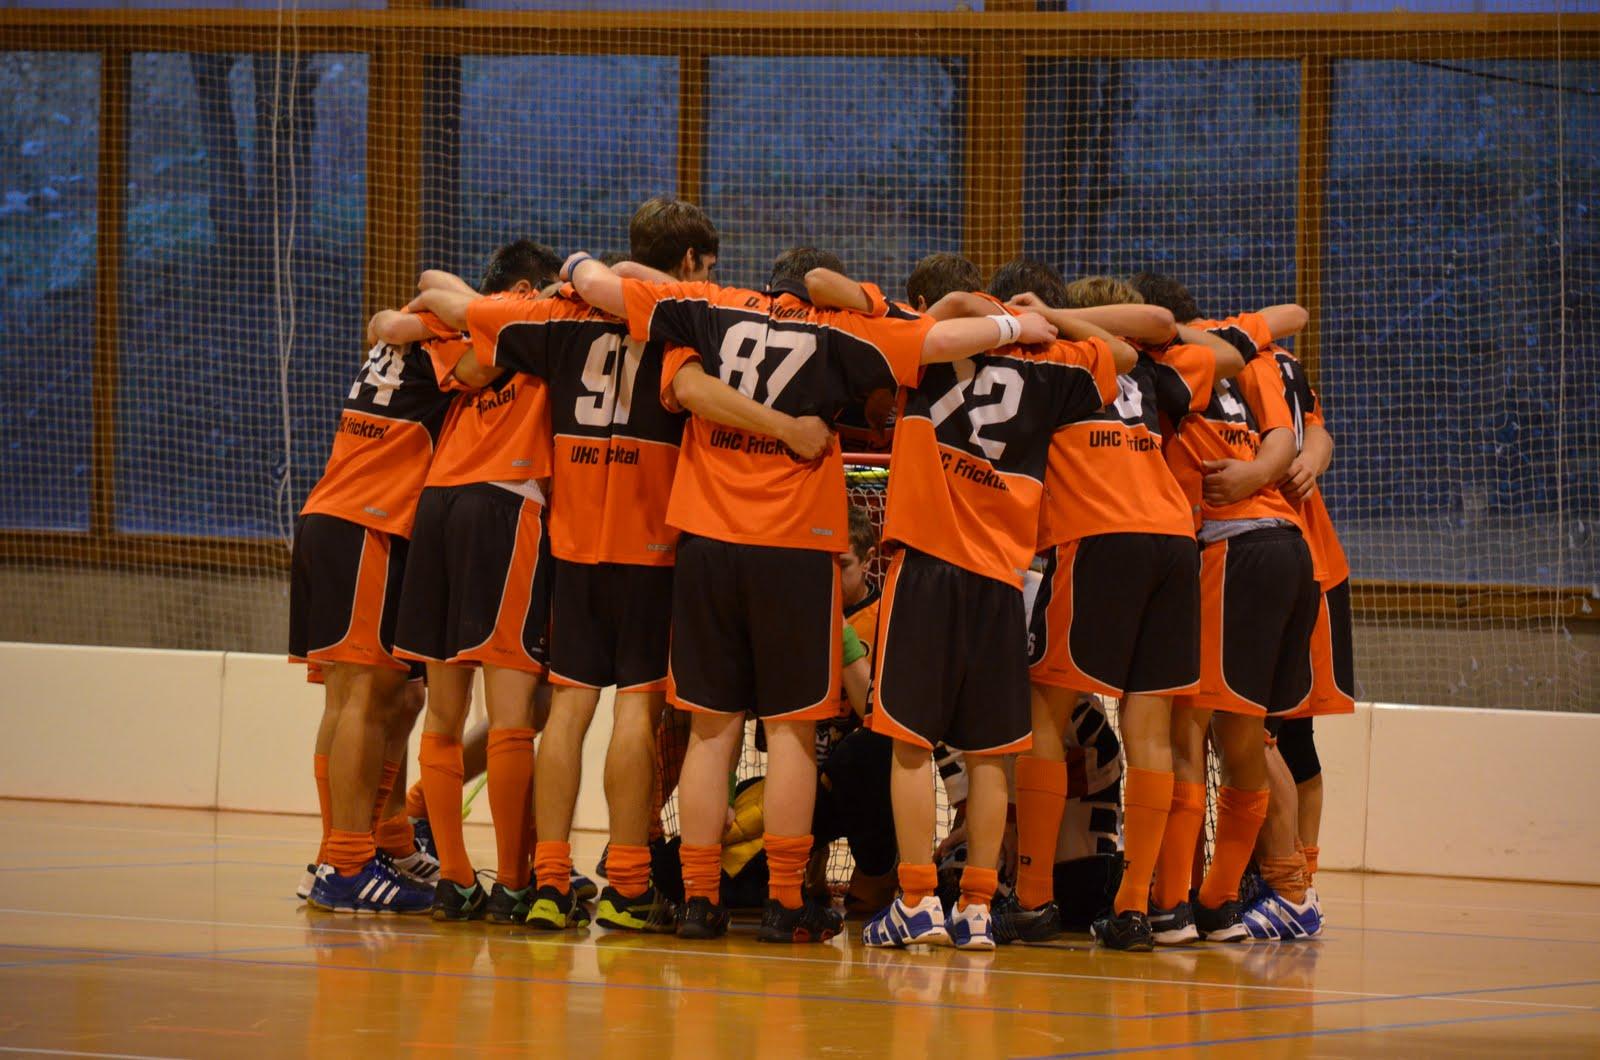 U21 vs Bremgarten